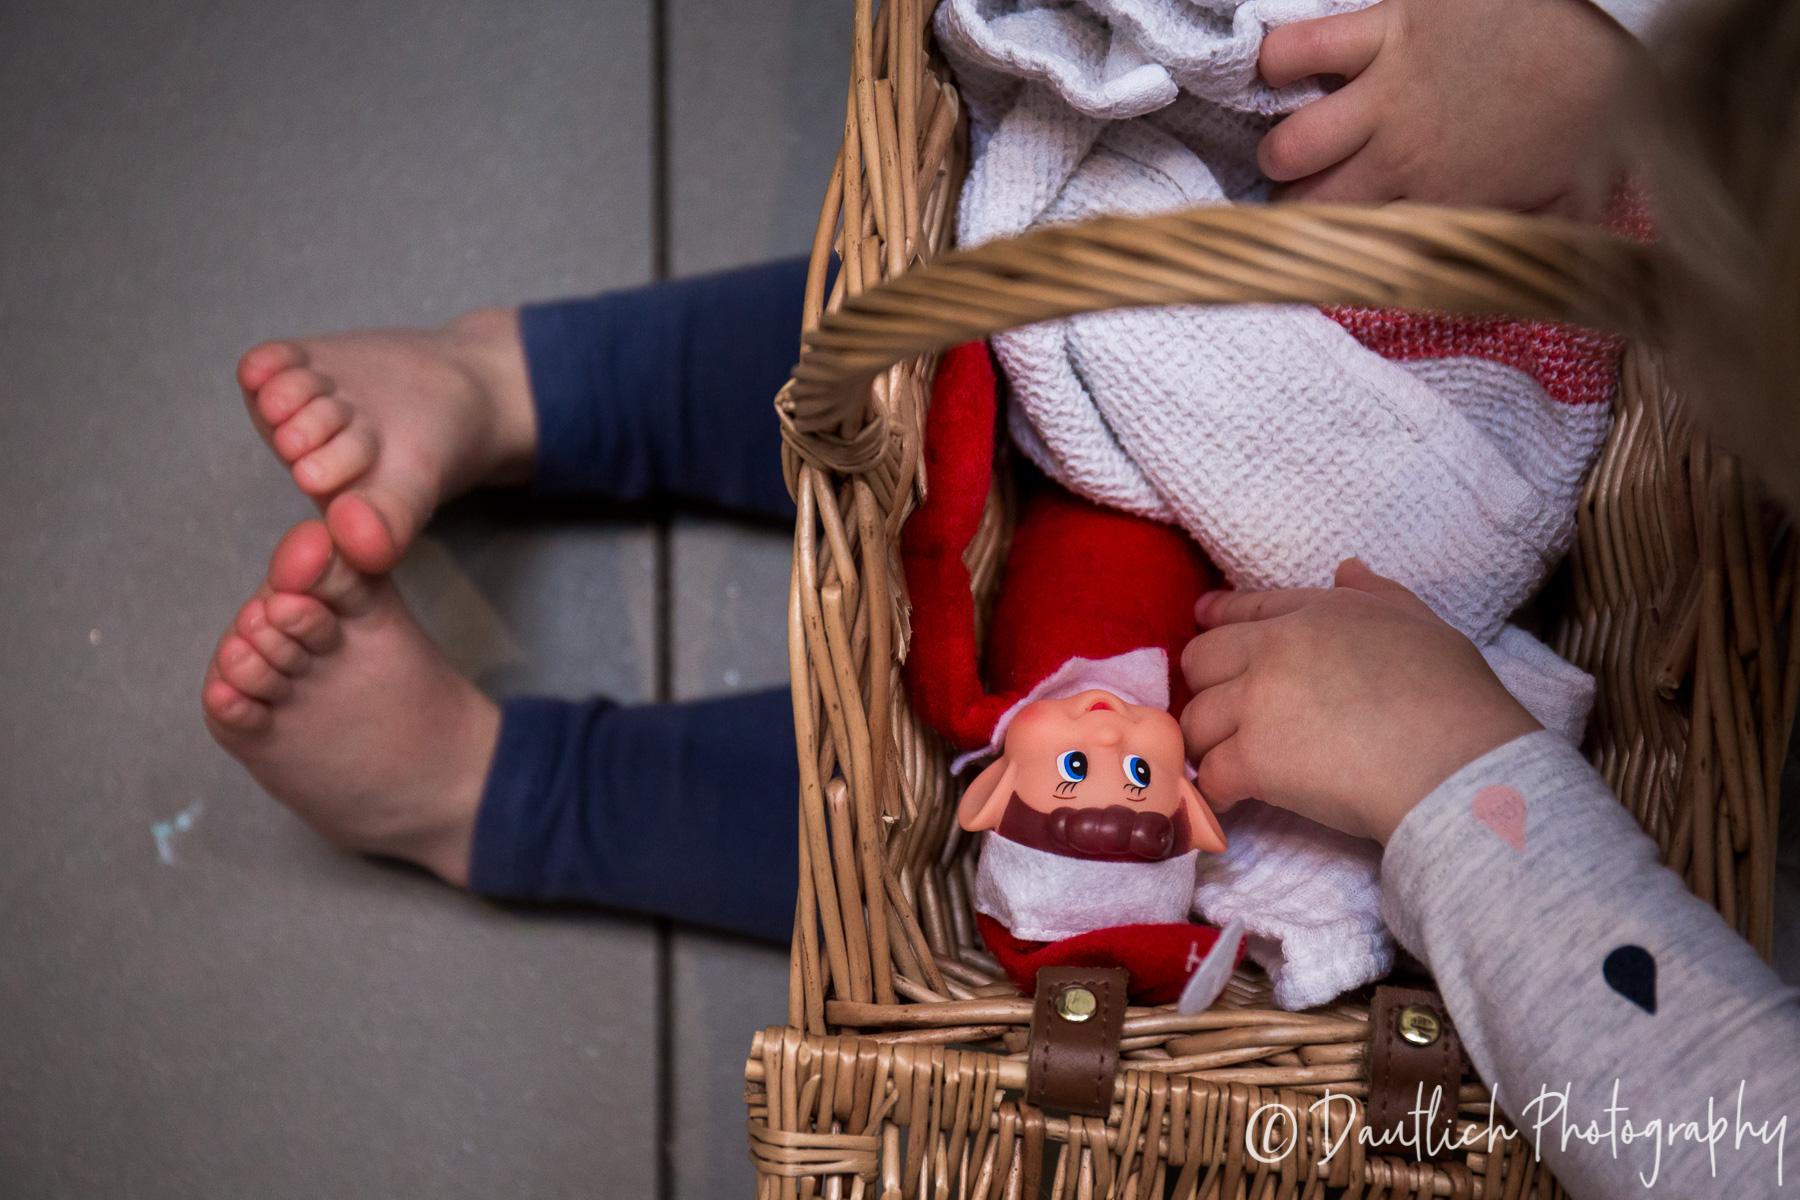 Dautlich_Photography_Apostolov_reedit-9.jpg